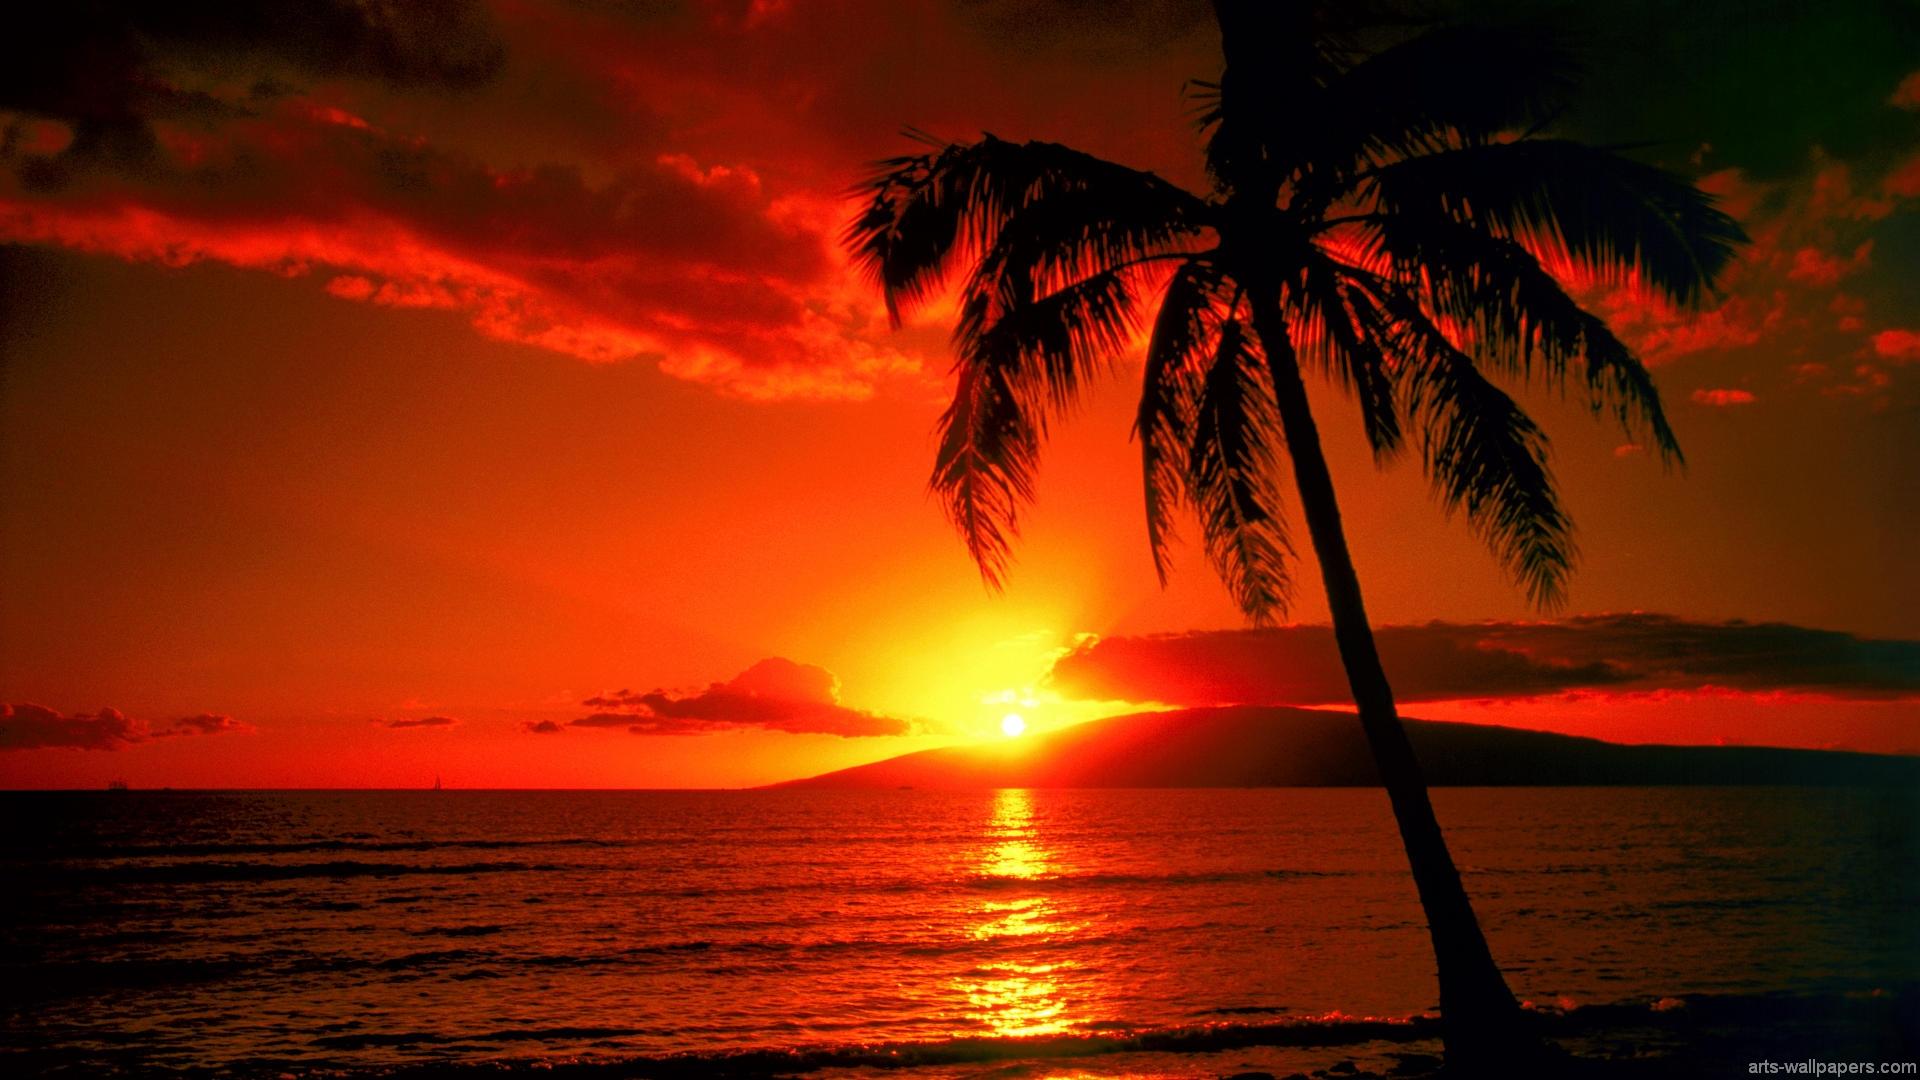 island sunset hd wallpapers tropical island sunset hd wallpapers 1920x1080